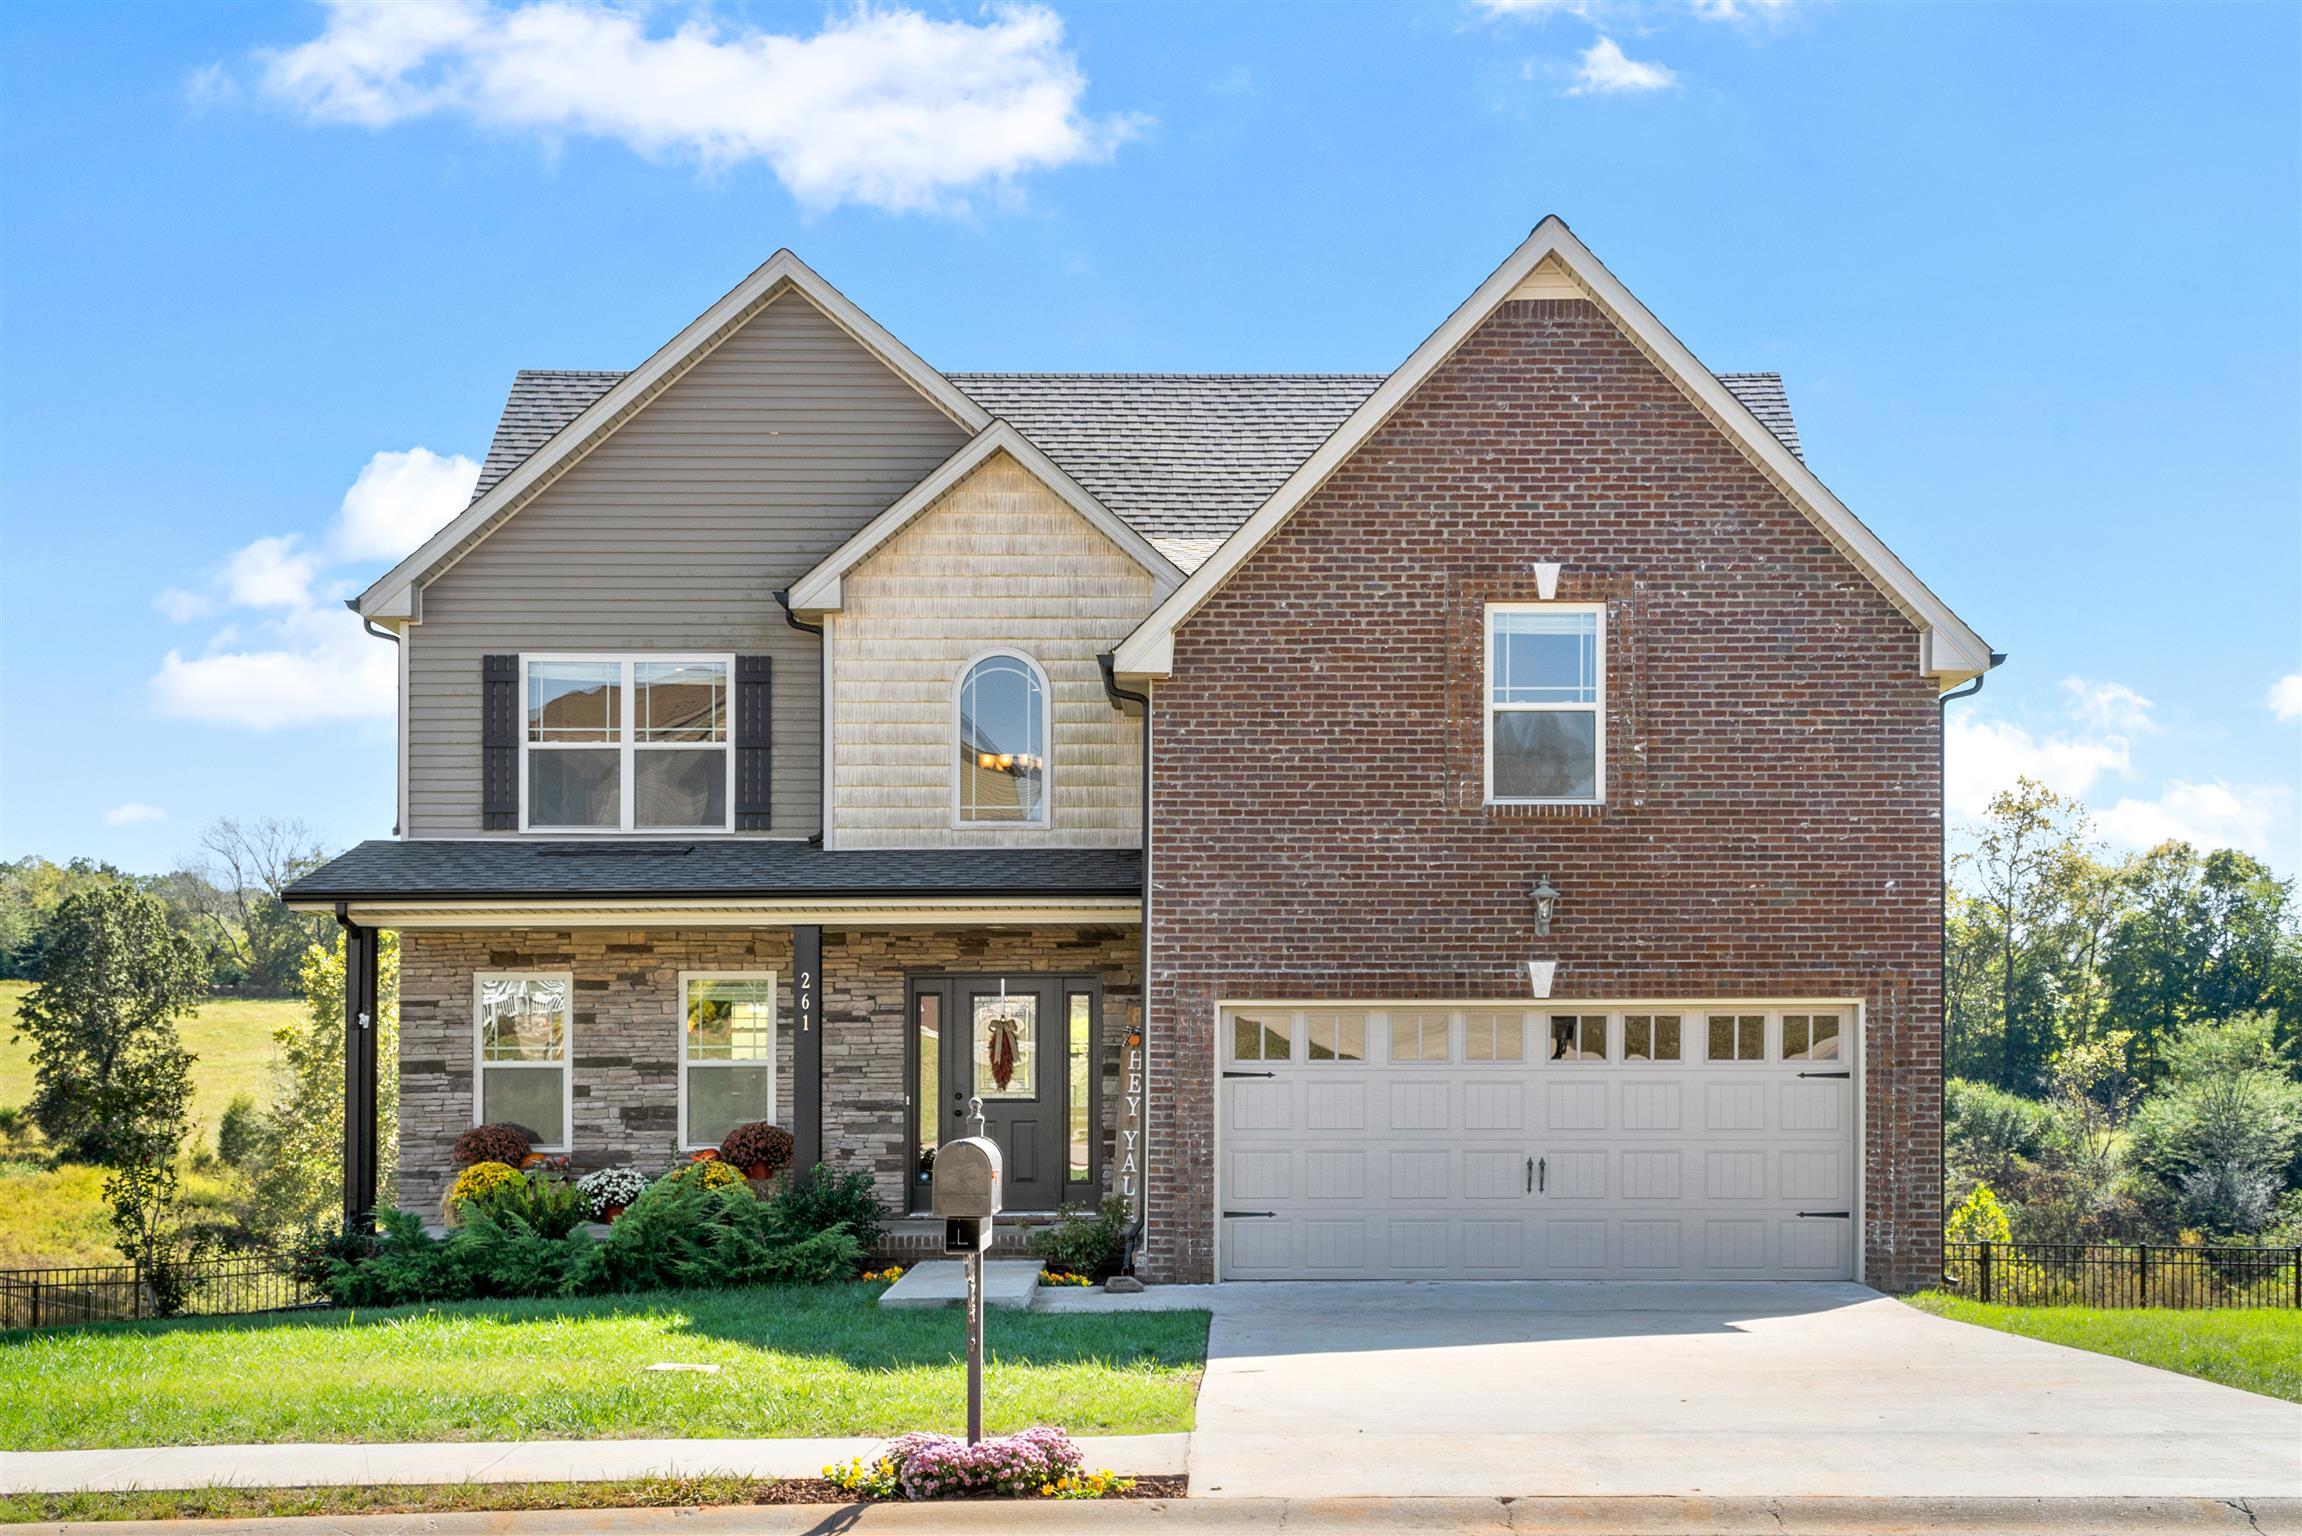 261 Ivy Bend Cir, Clarksville, TN 37043 - Clarksville, TN real estate listing